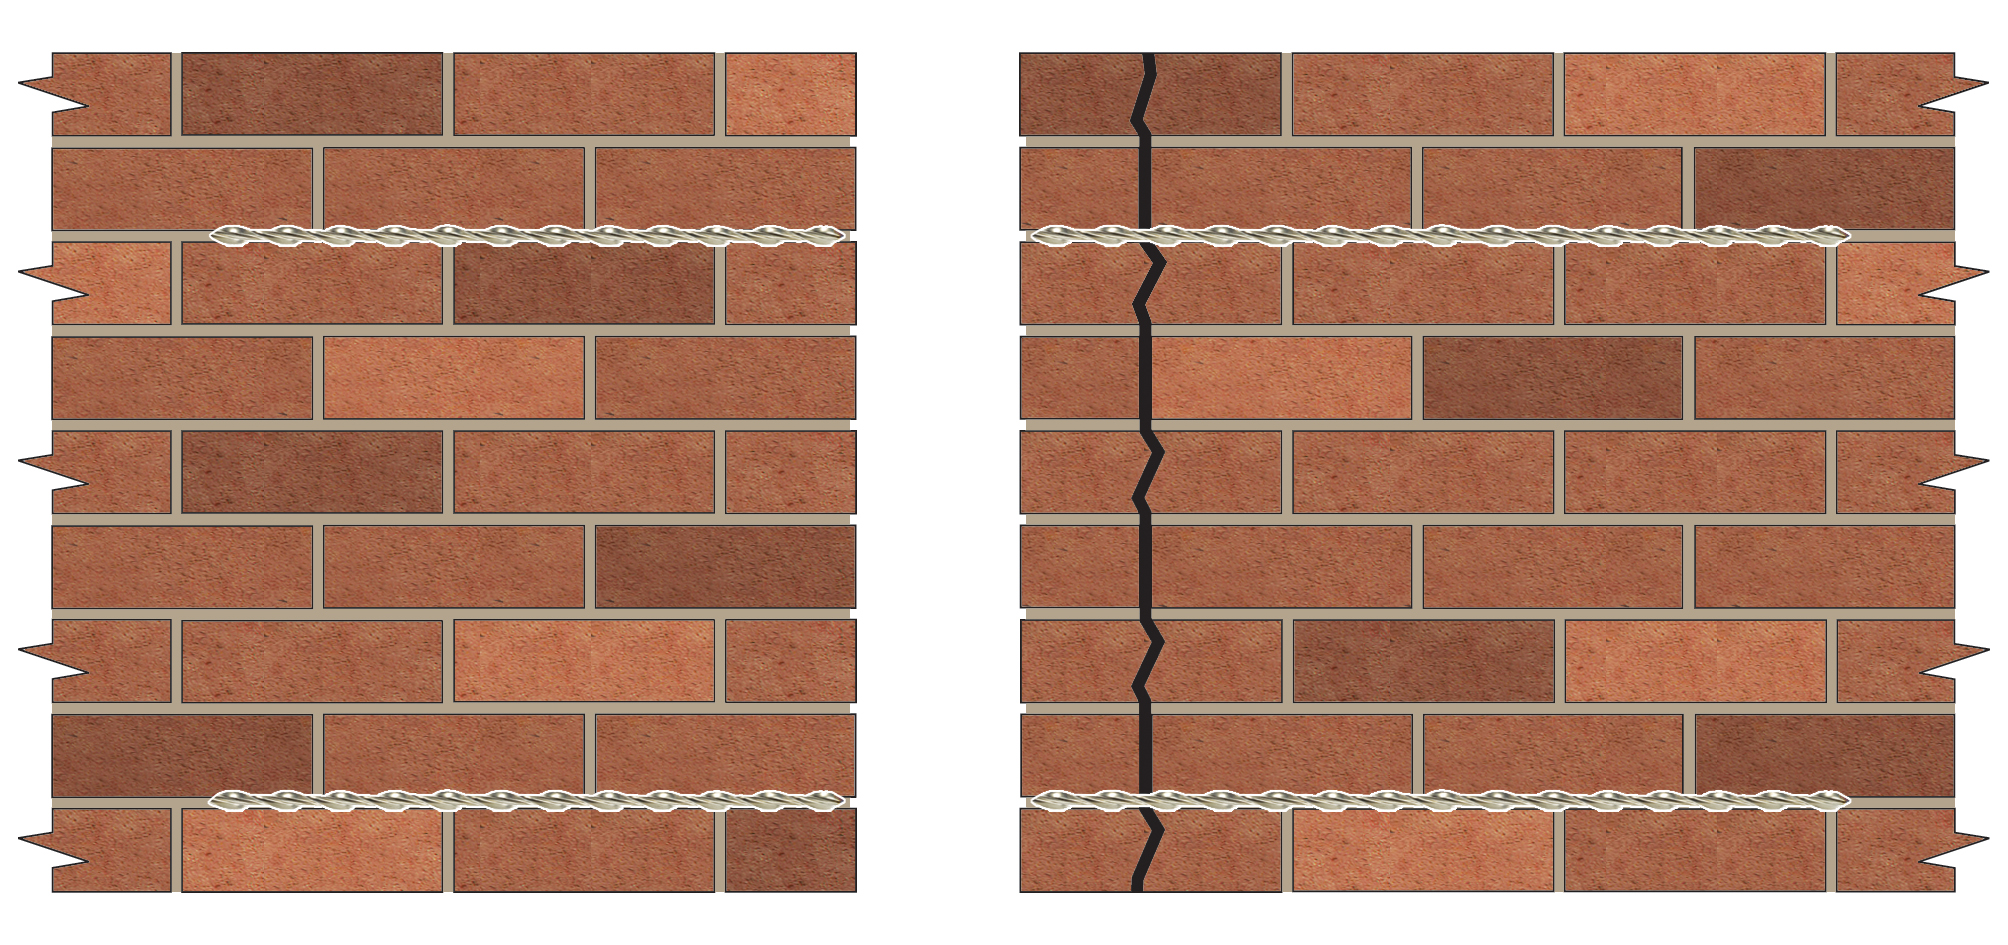 Applications Repairing Cracks Near Corners And Openings